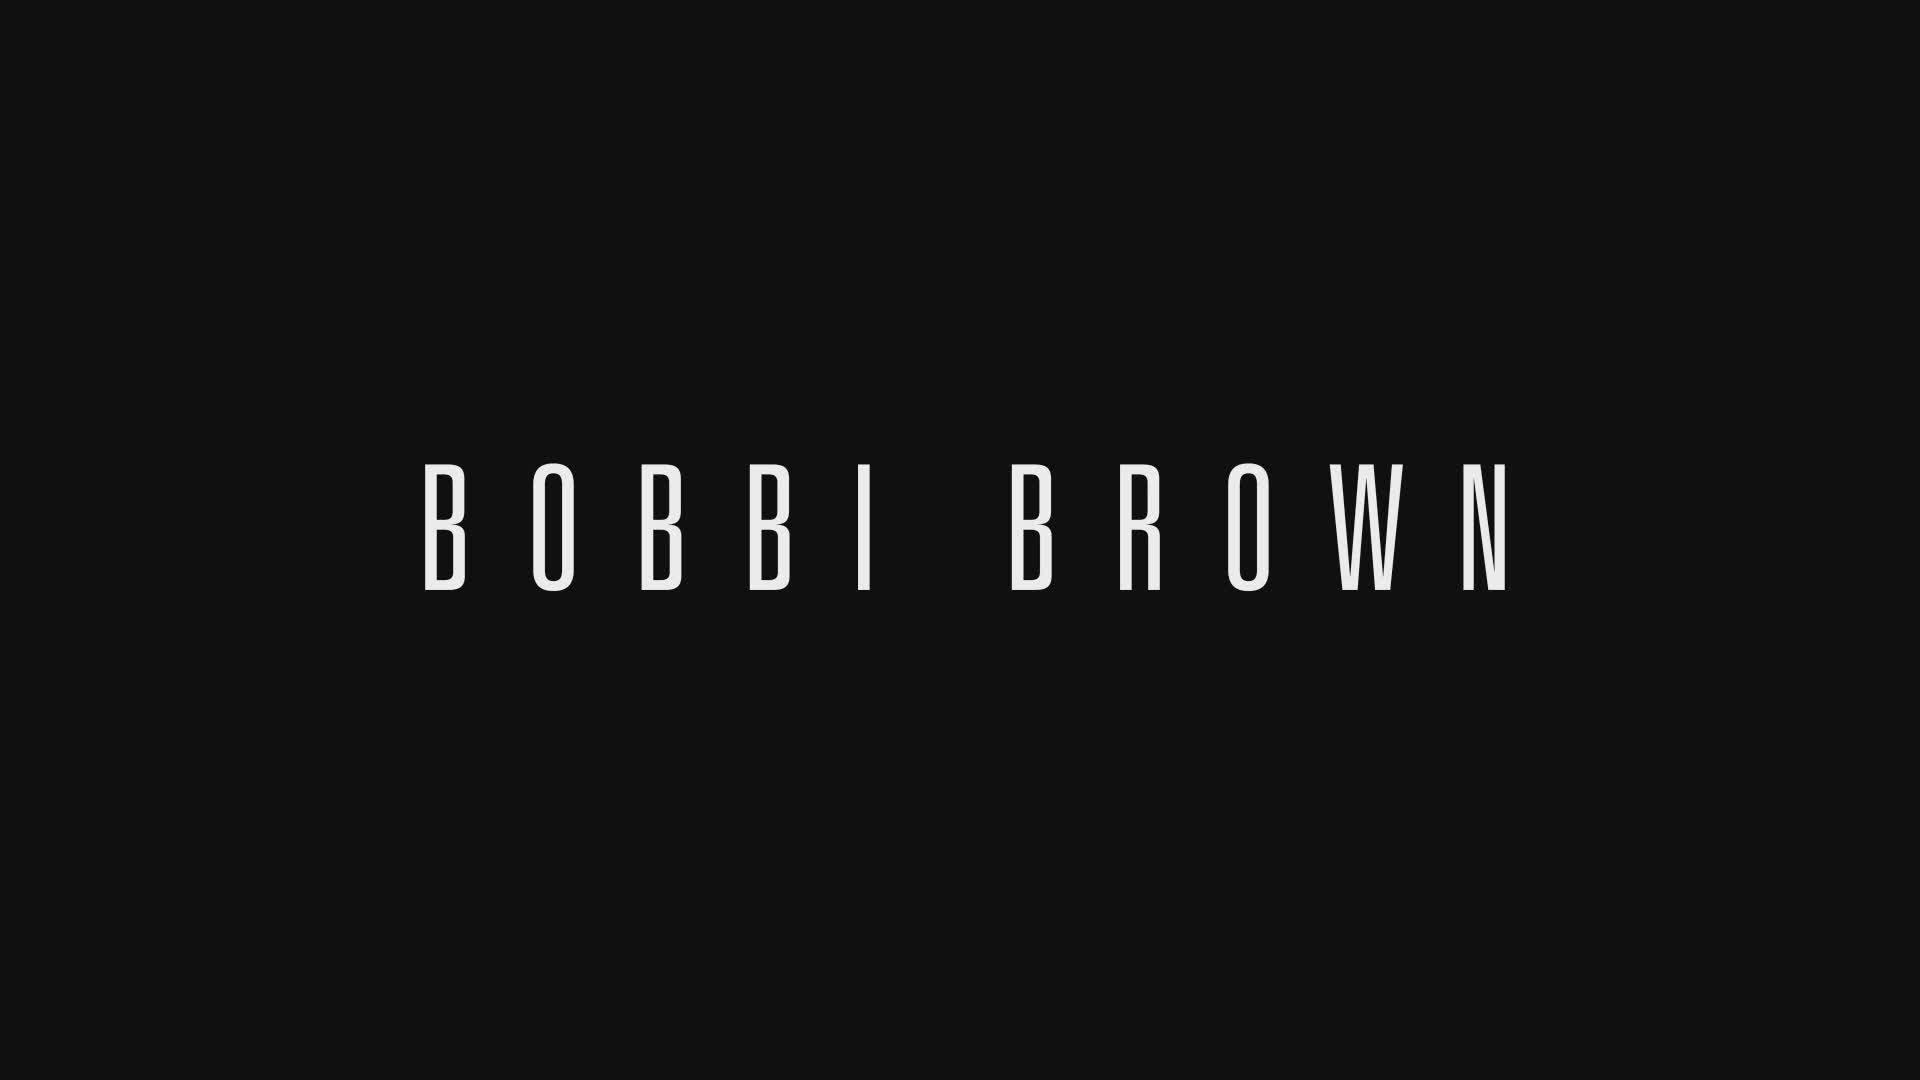 Bobbi Brown On Sale Coupons & Promo codes